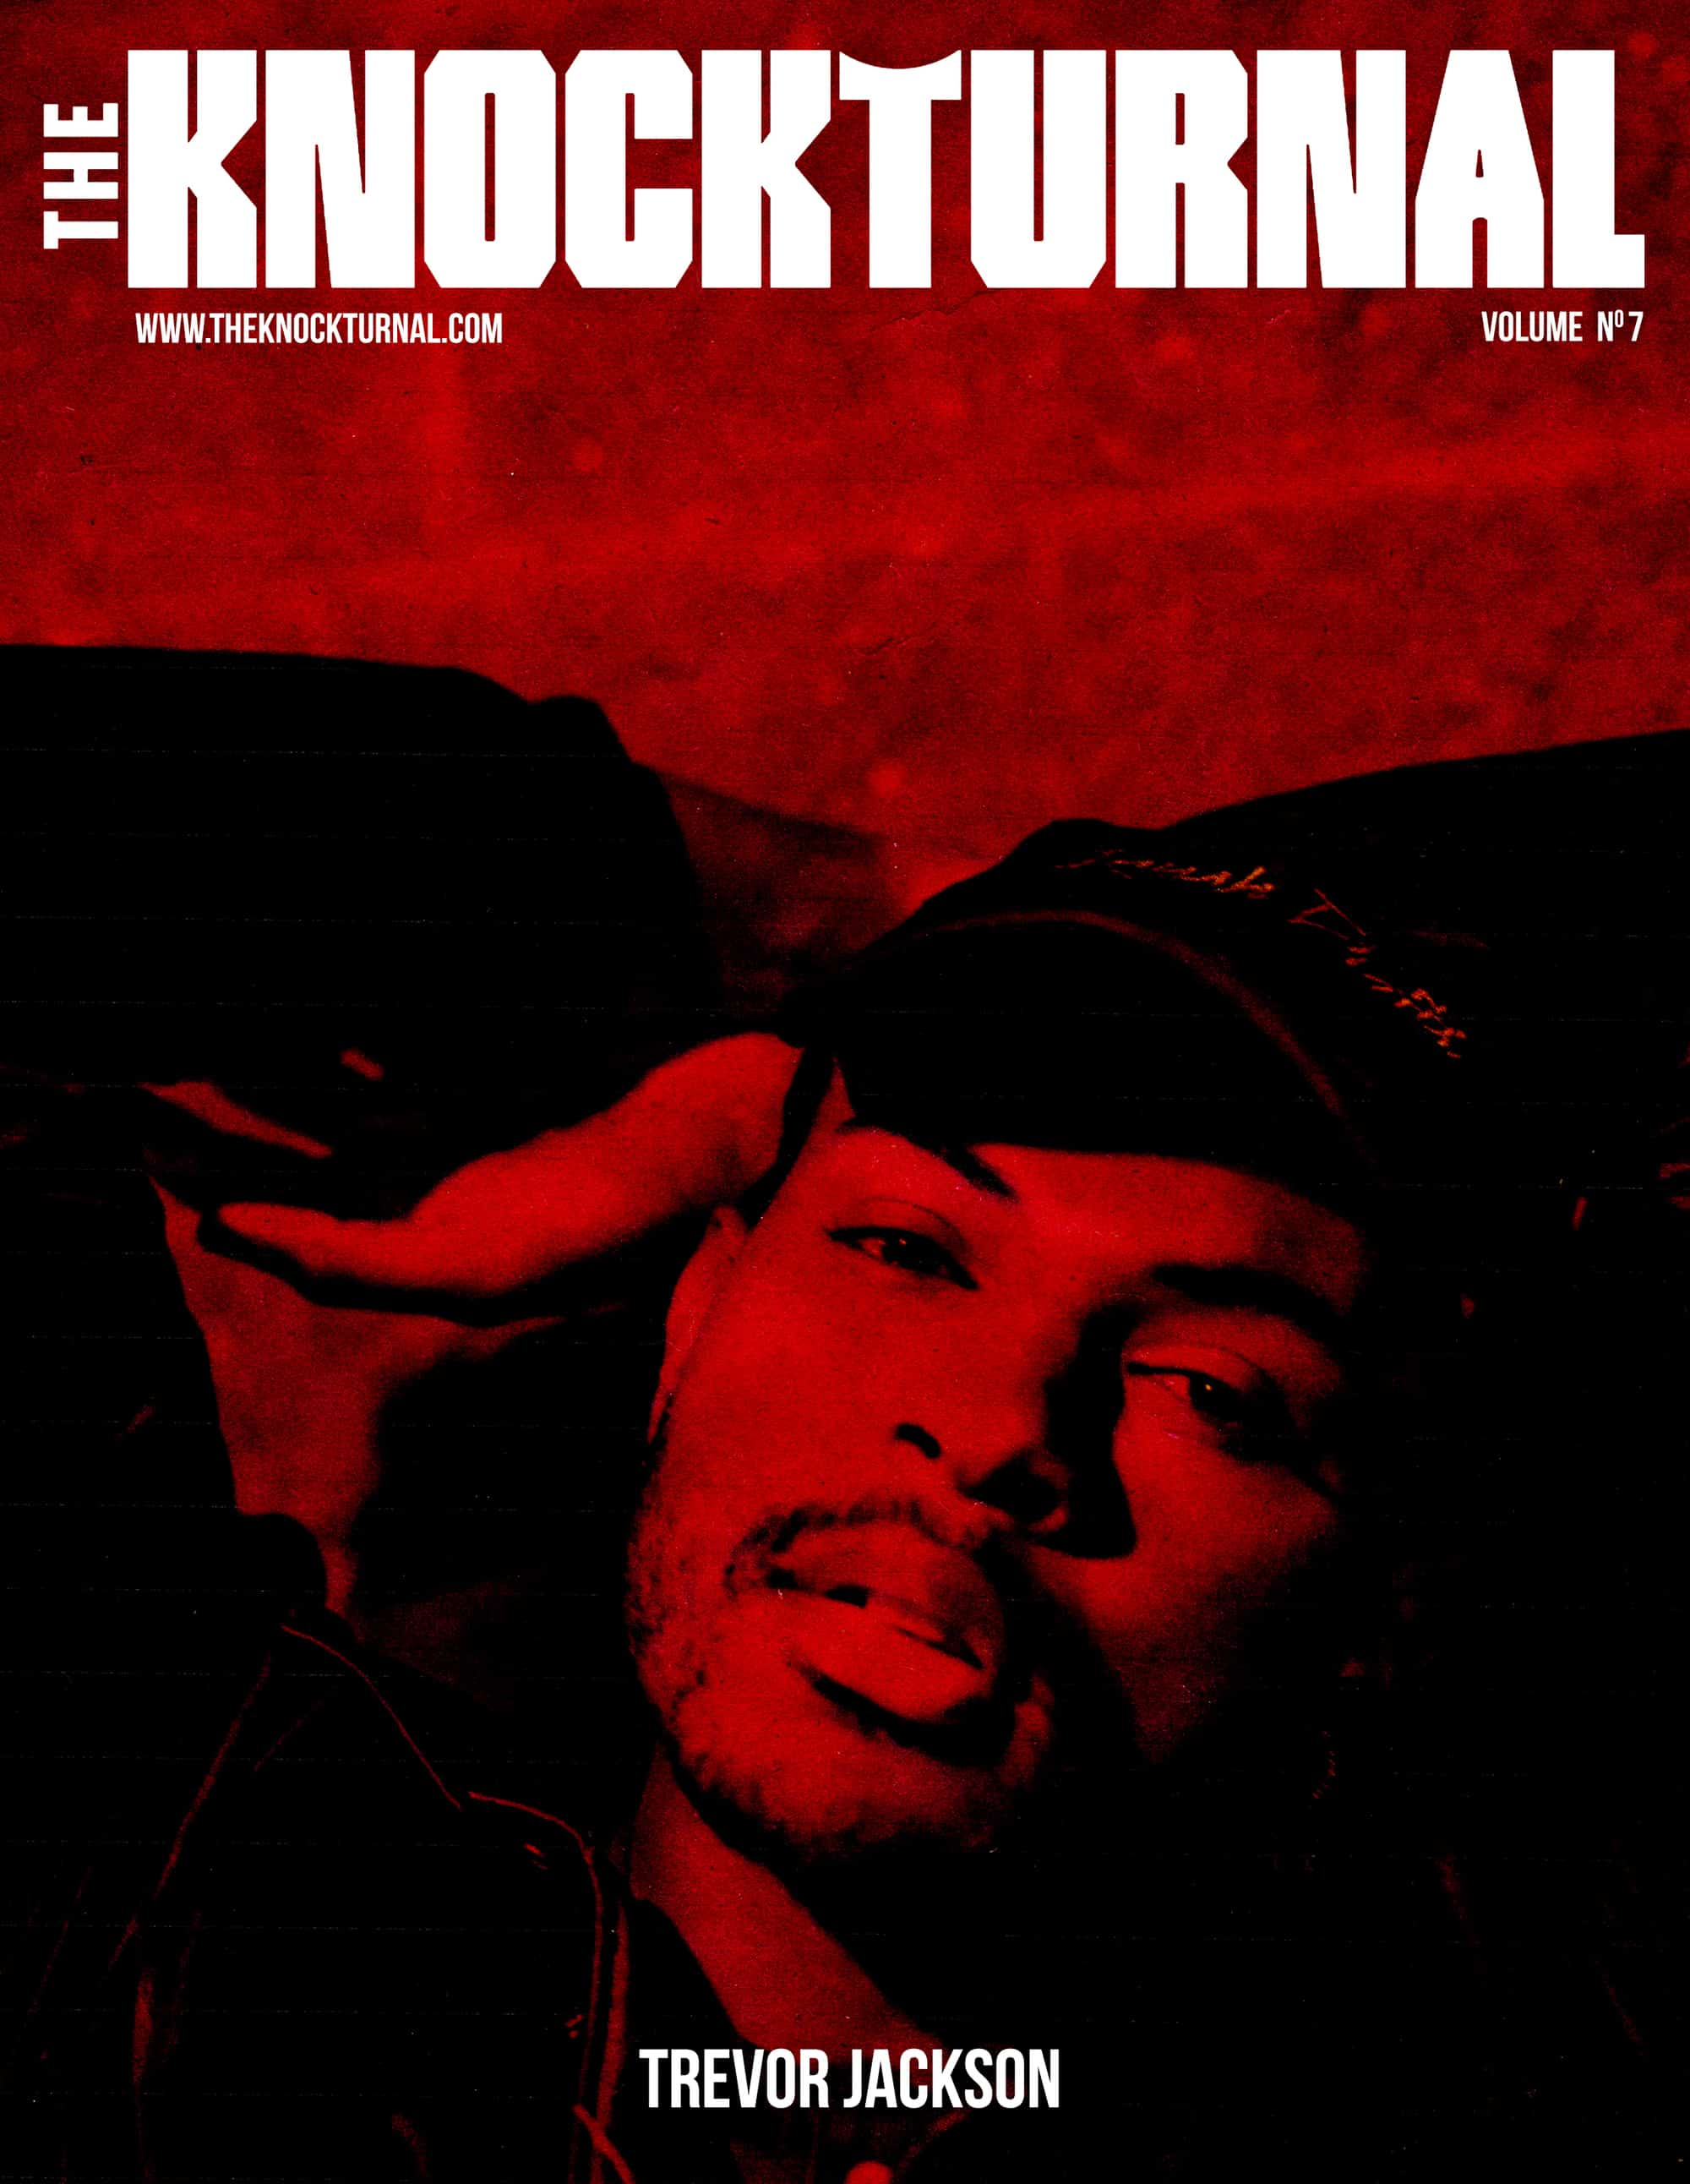 Trevor Jackson Graces The Knockturnal's Seventh Digital Cover